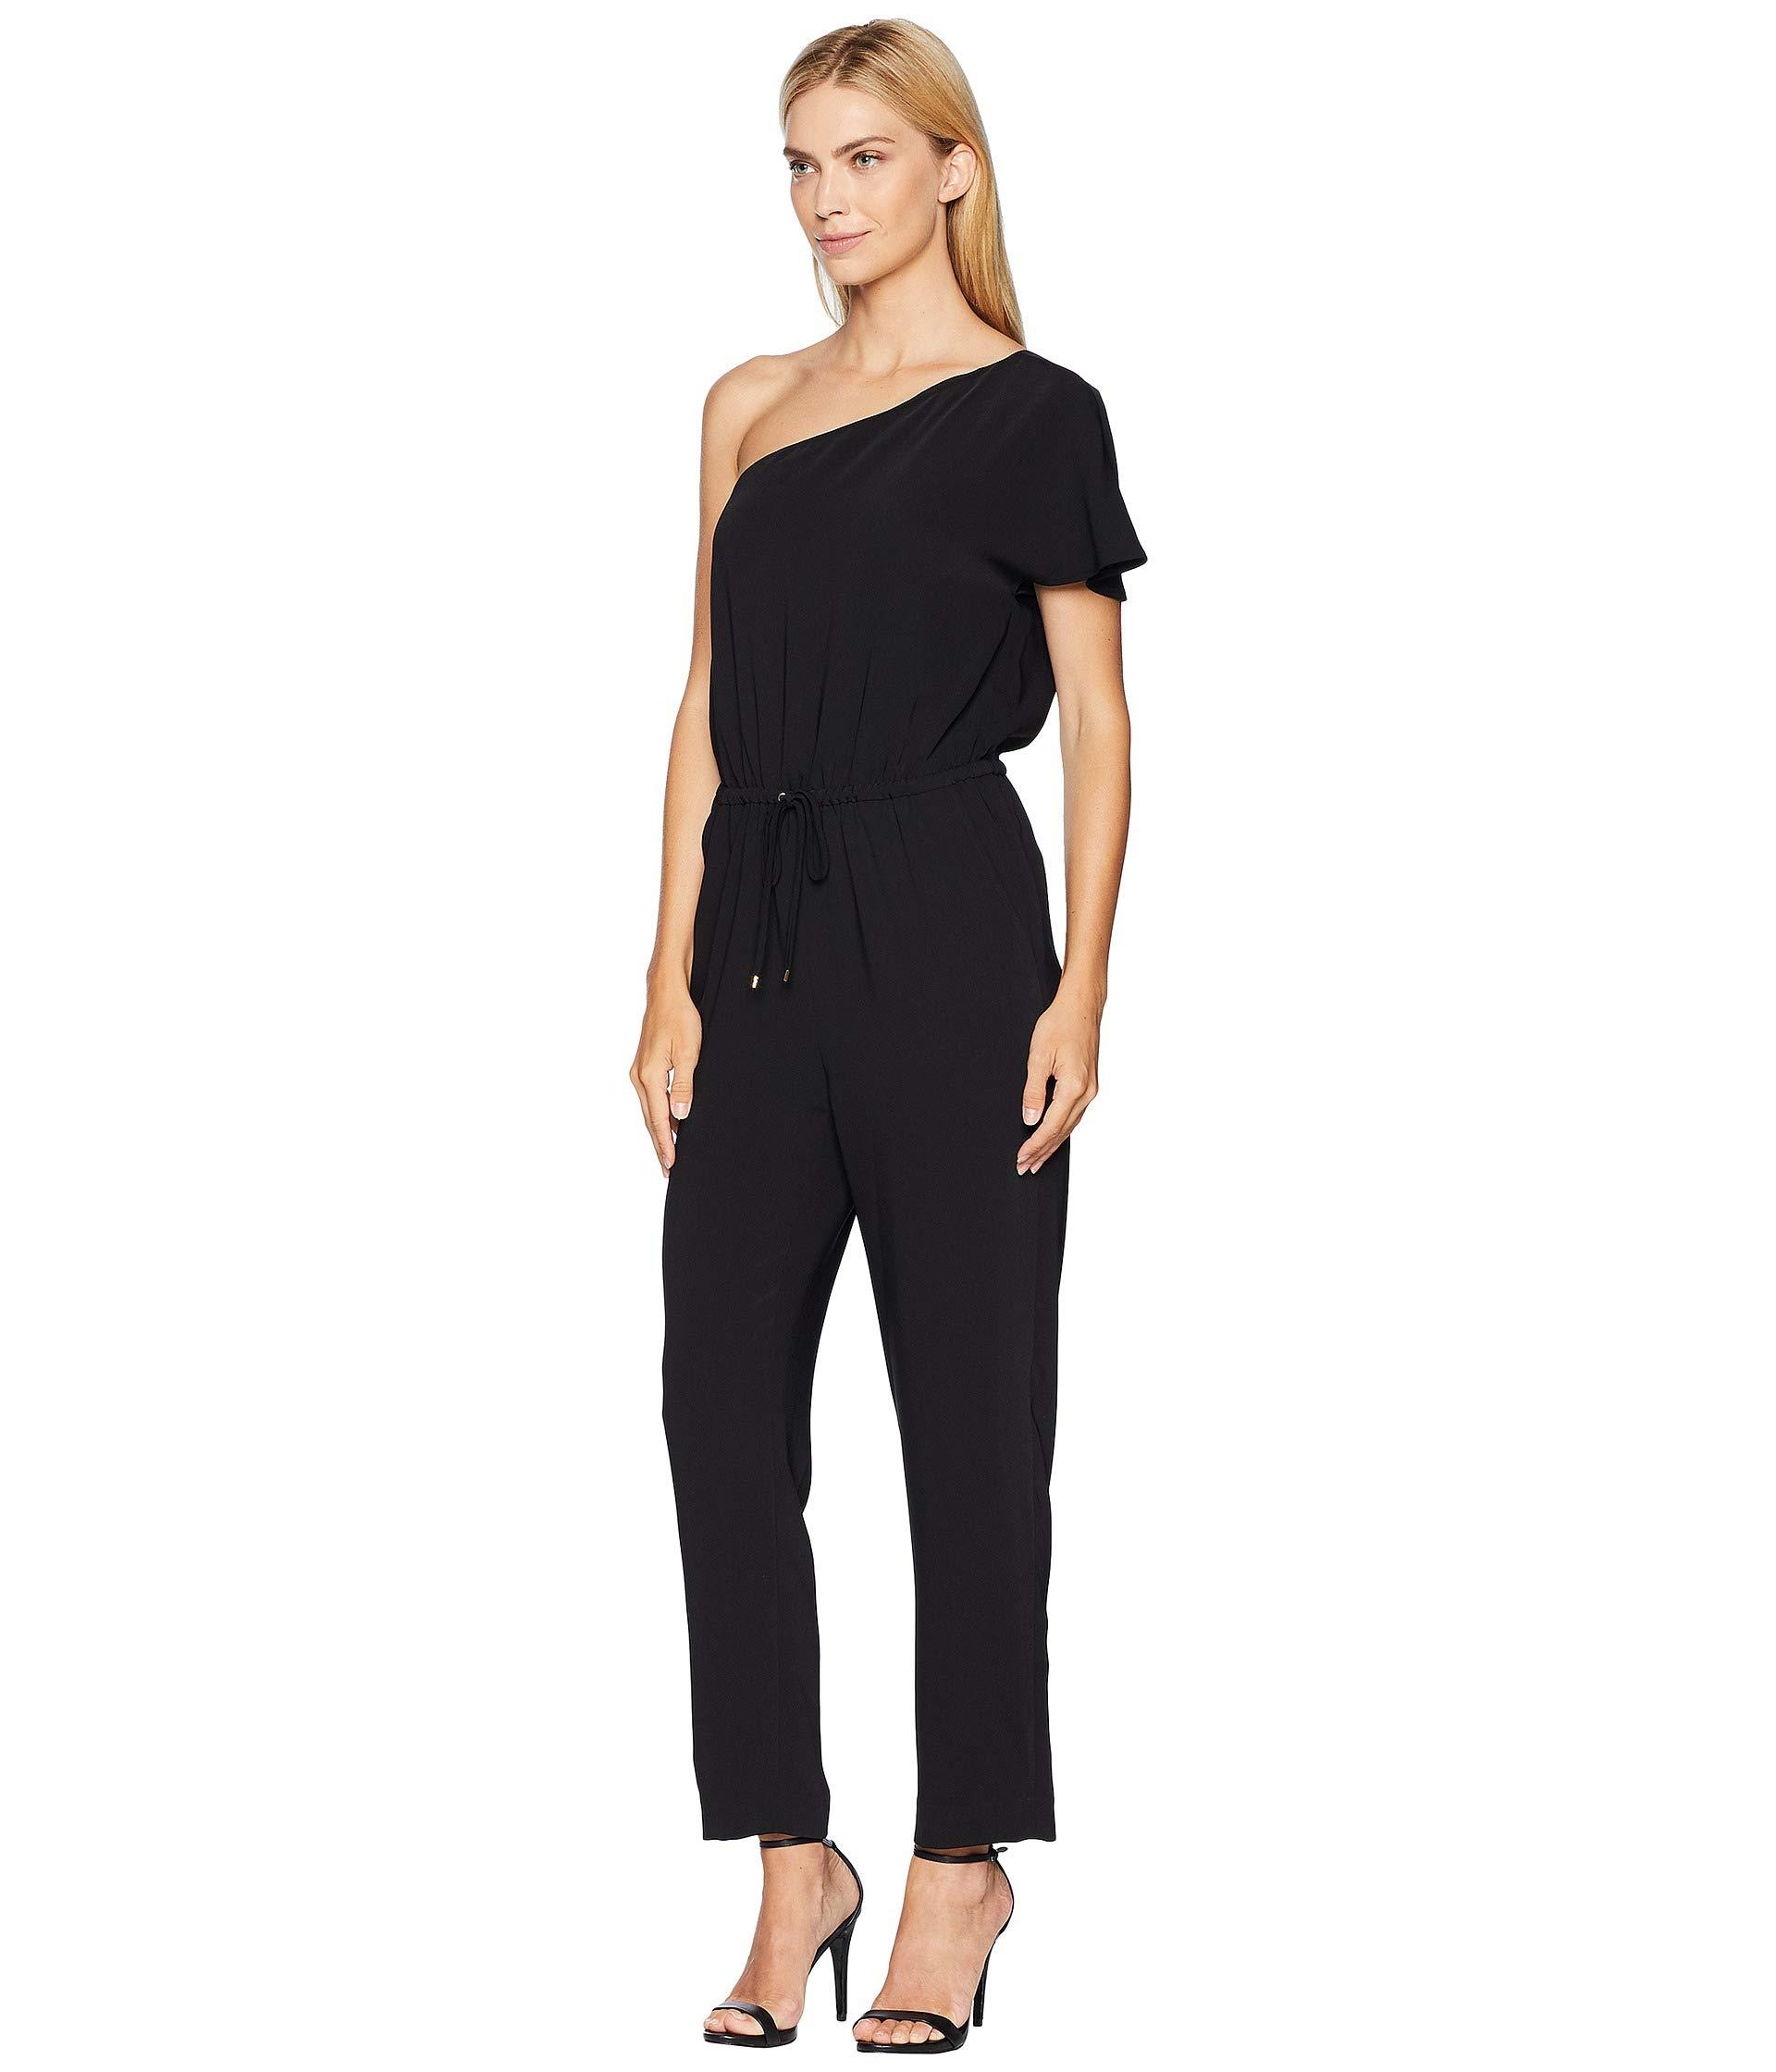 51a5263cfa9 Lyst - Lauren by Ralph Lauren Twill One-shoulder Jumpsuit (polo Black)  Women s Jumpsuit   Rompers One Piece in Black